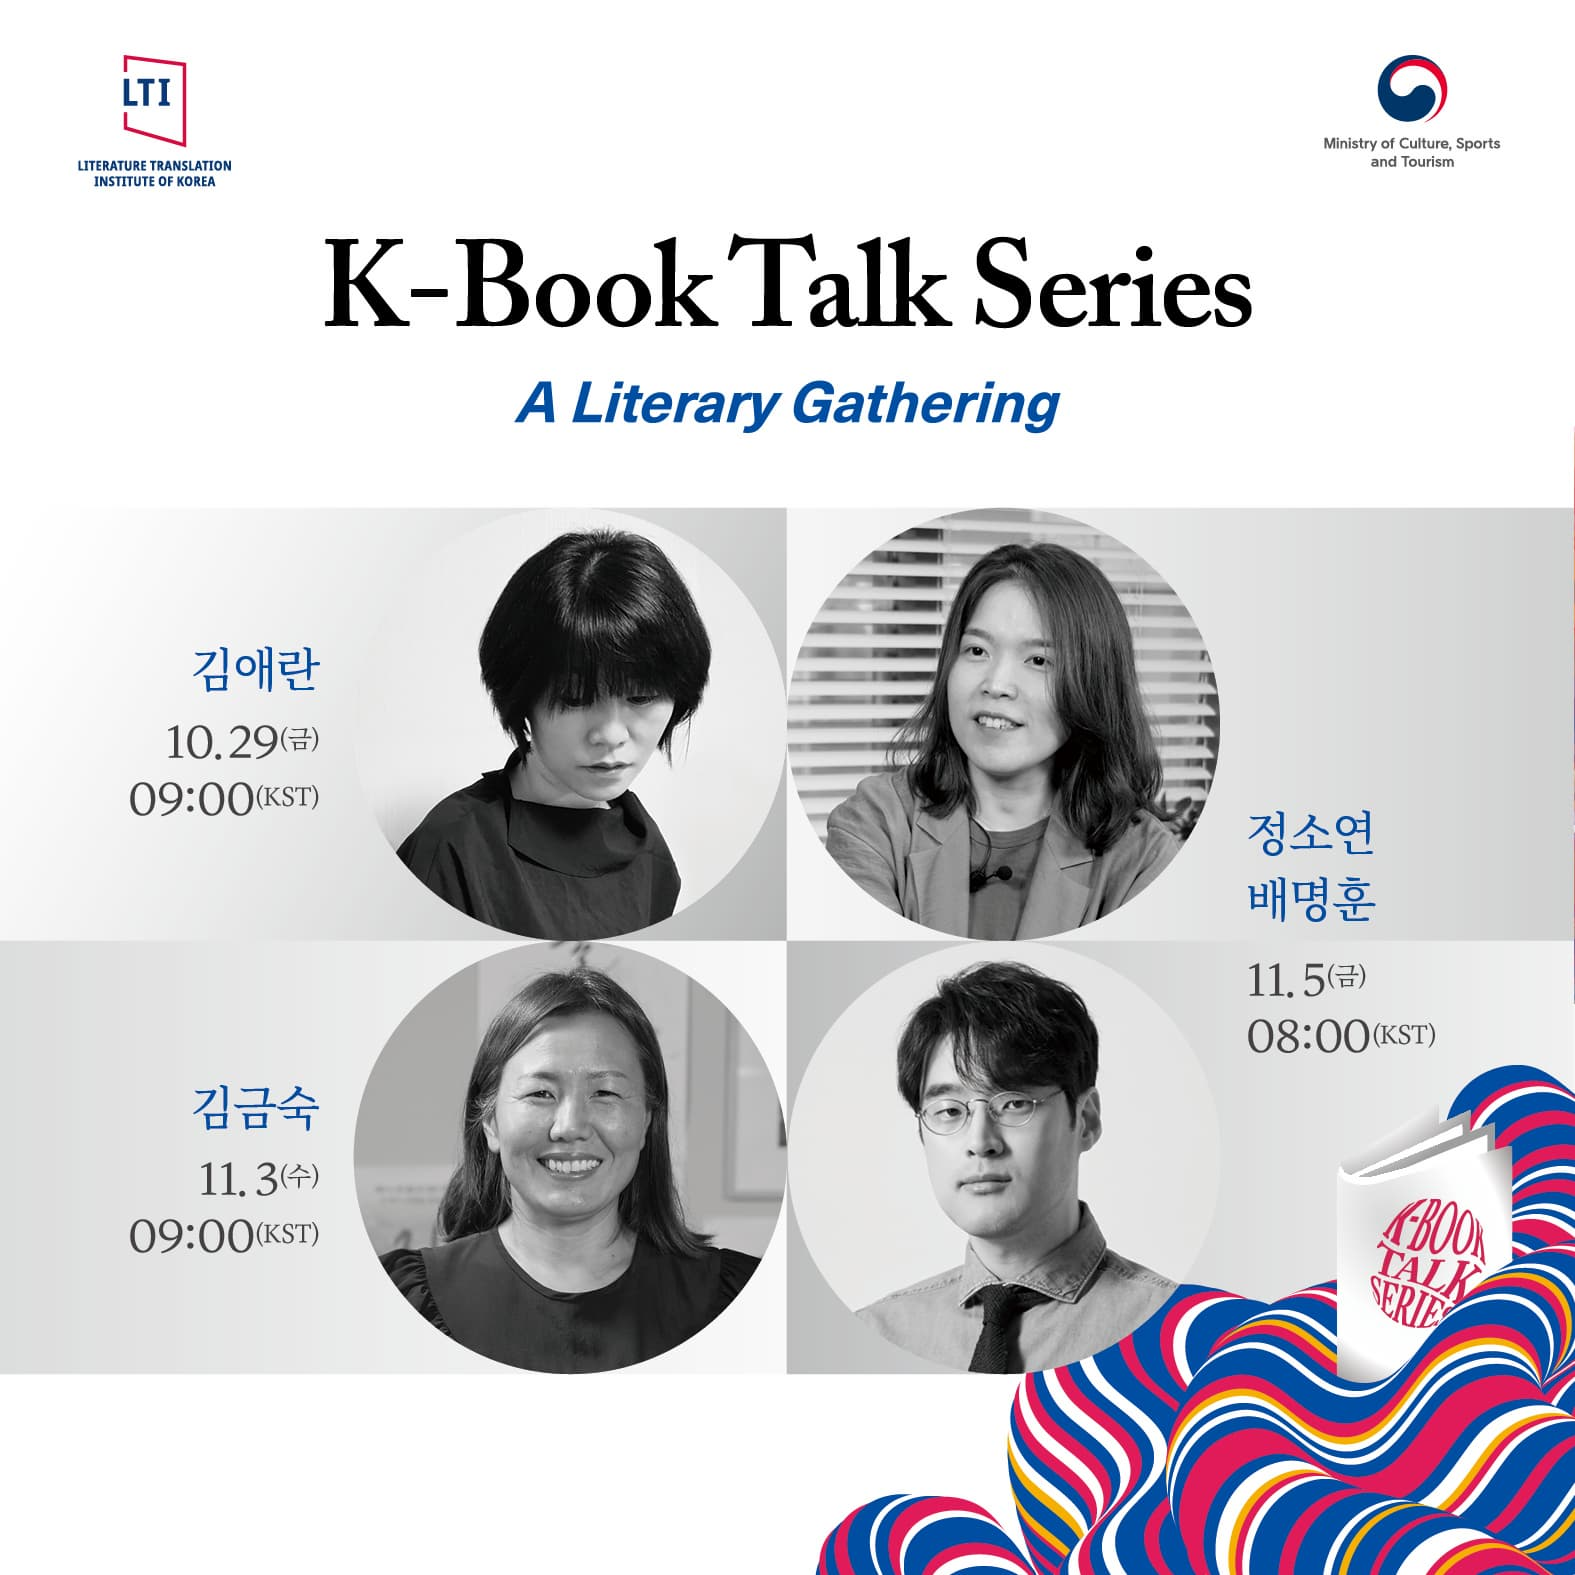 K-Book Talk Series 작가 대담 라이브(김애란, 김금숙, 배명훈, 정소연 등)